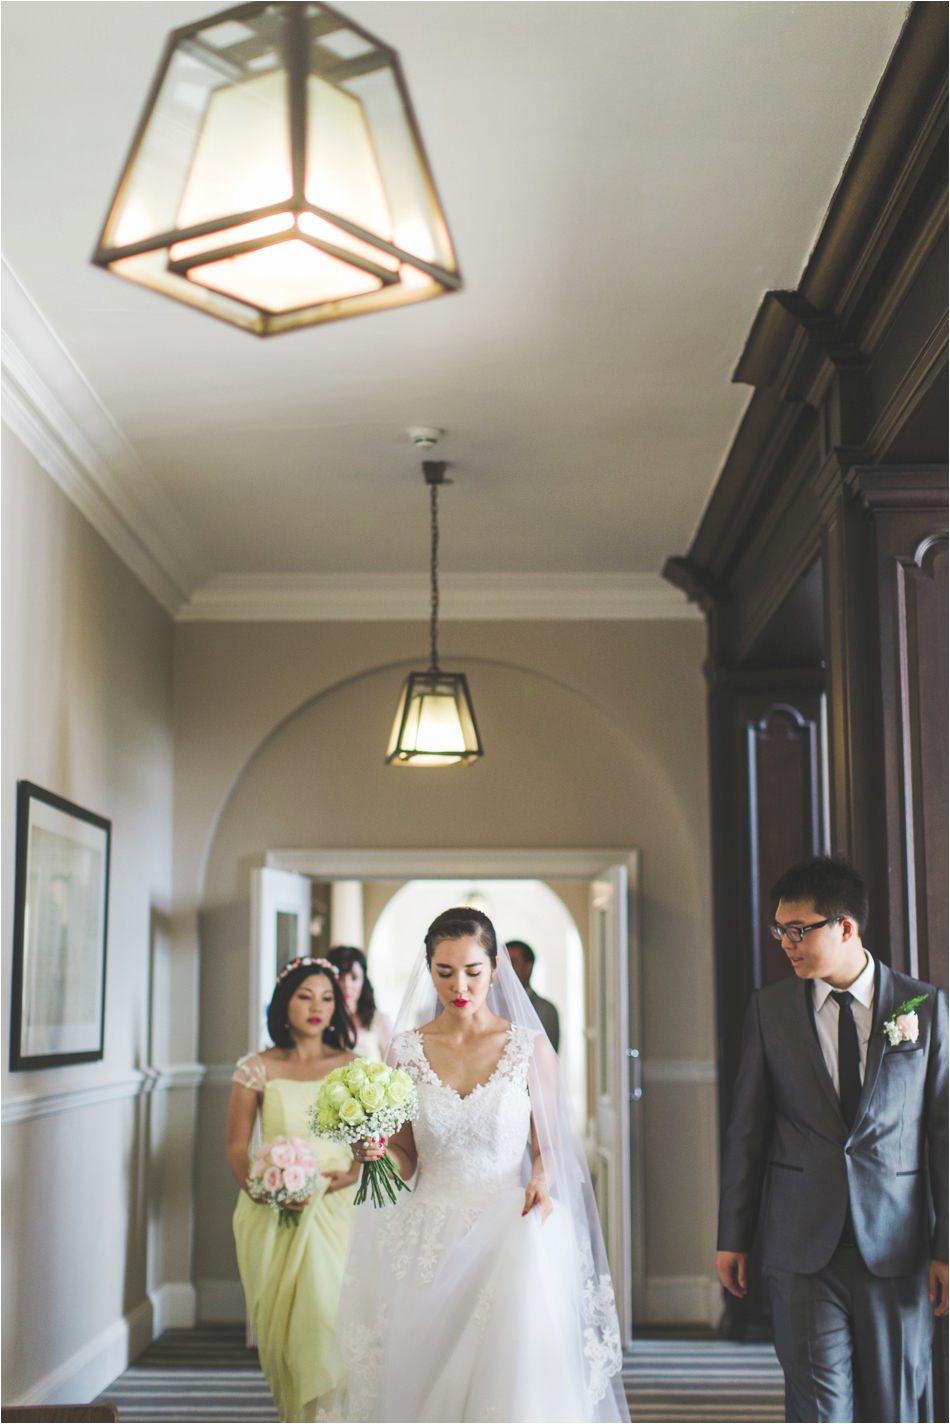 fine art wedding photographers scotland glasgow 4-4.jpg